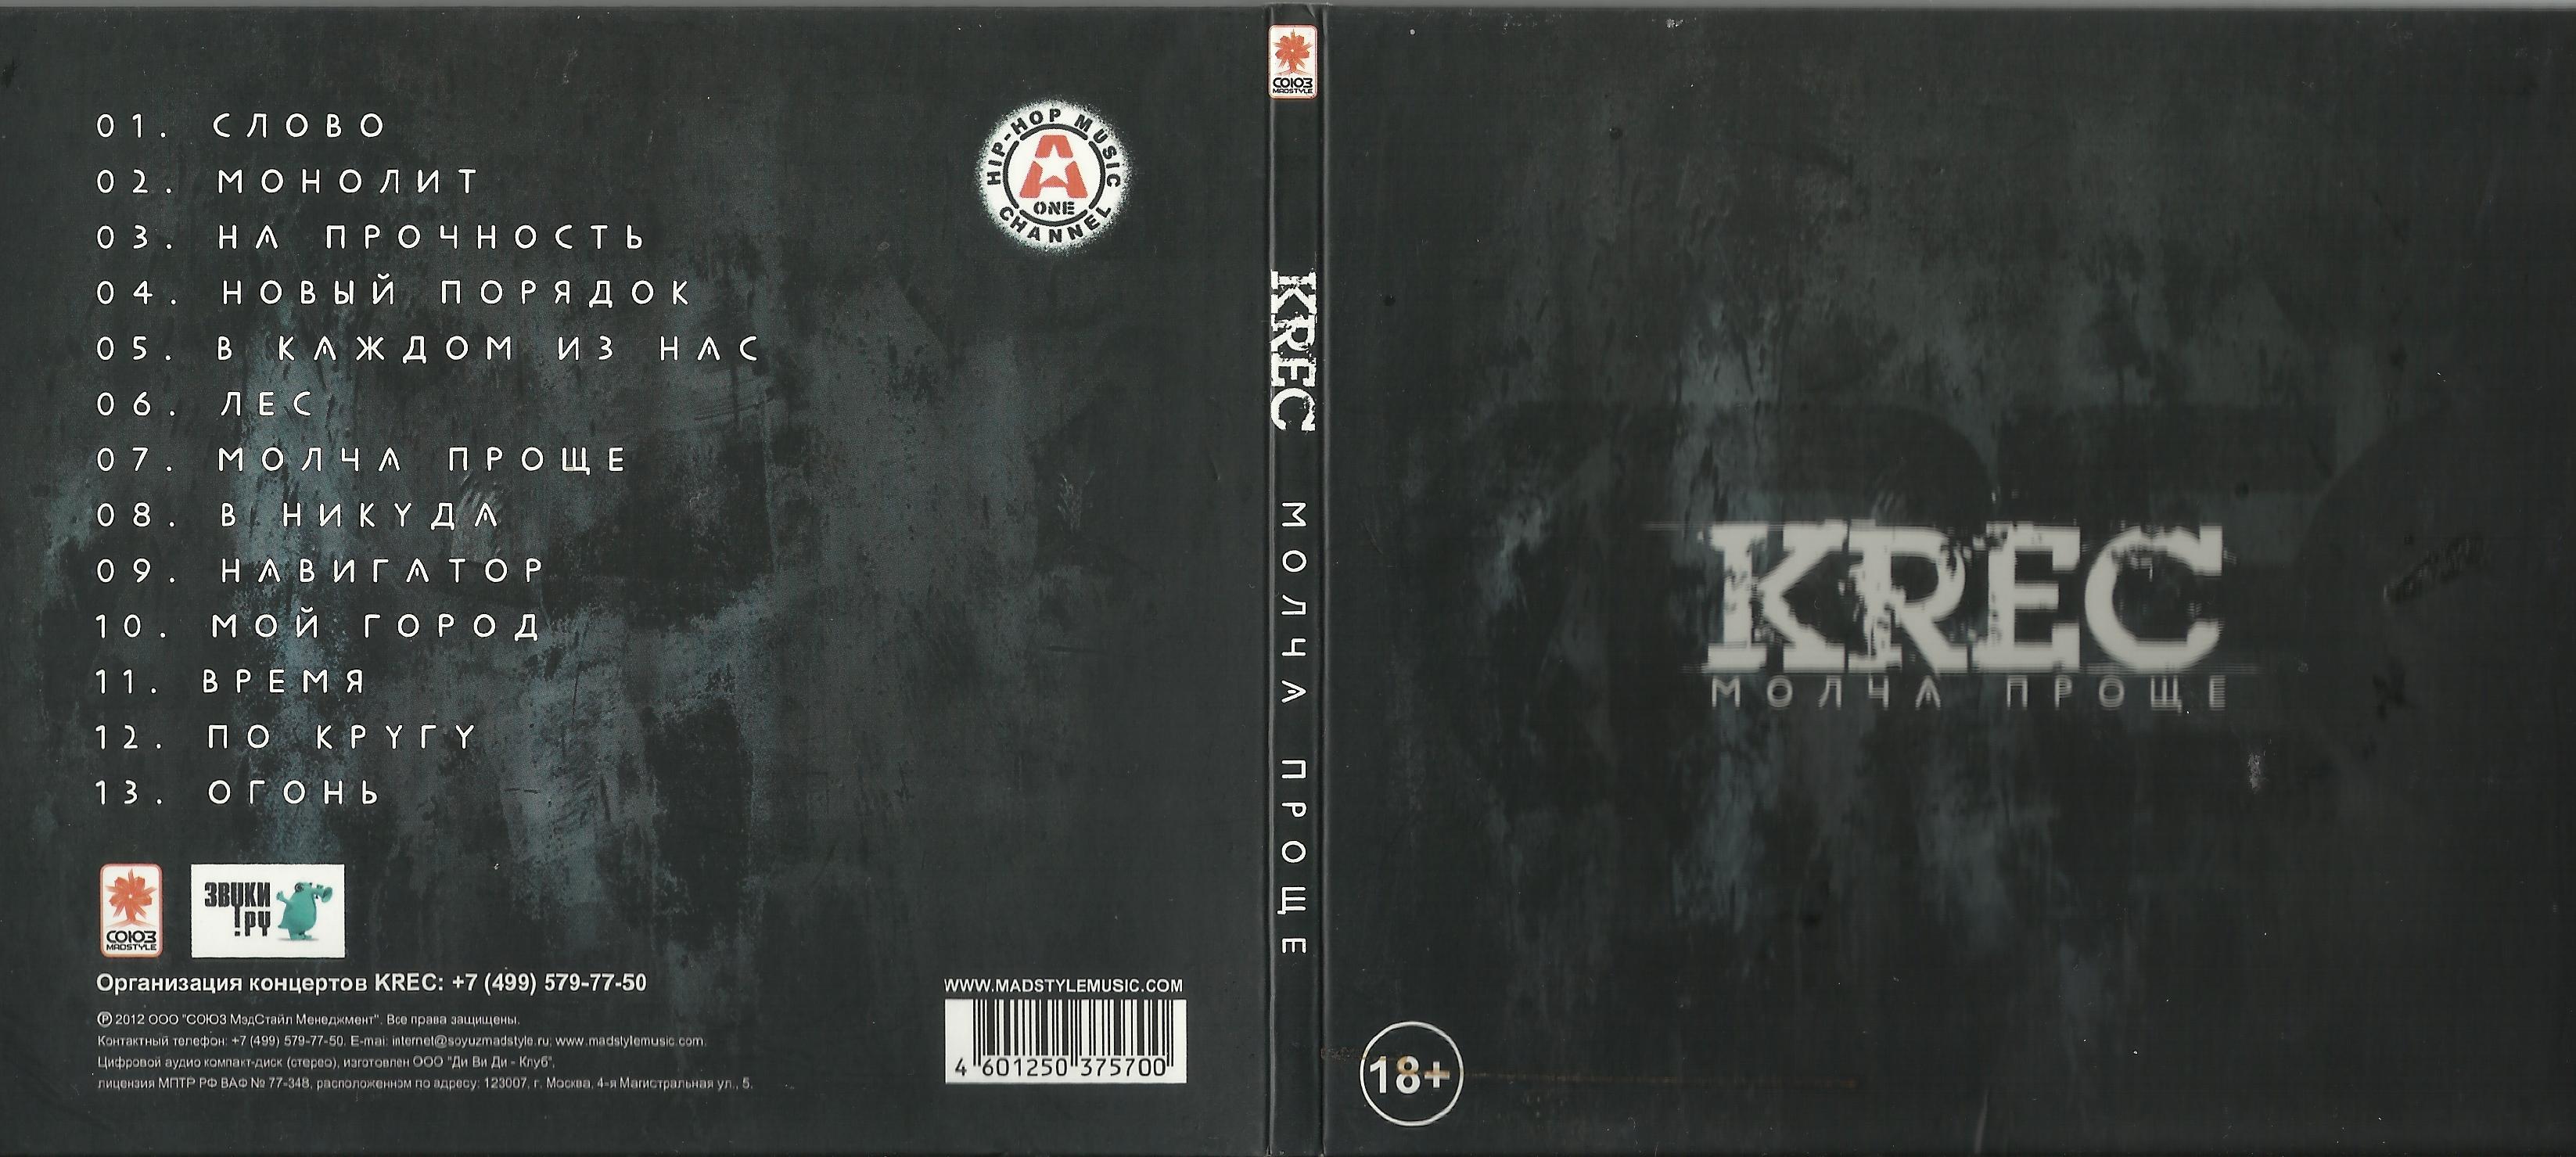 KRec - Молча проще (FLAC) Хип-Хоп Портал - Мы объединили Хип-Хоп.